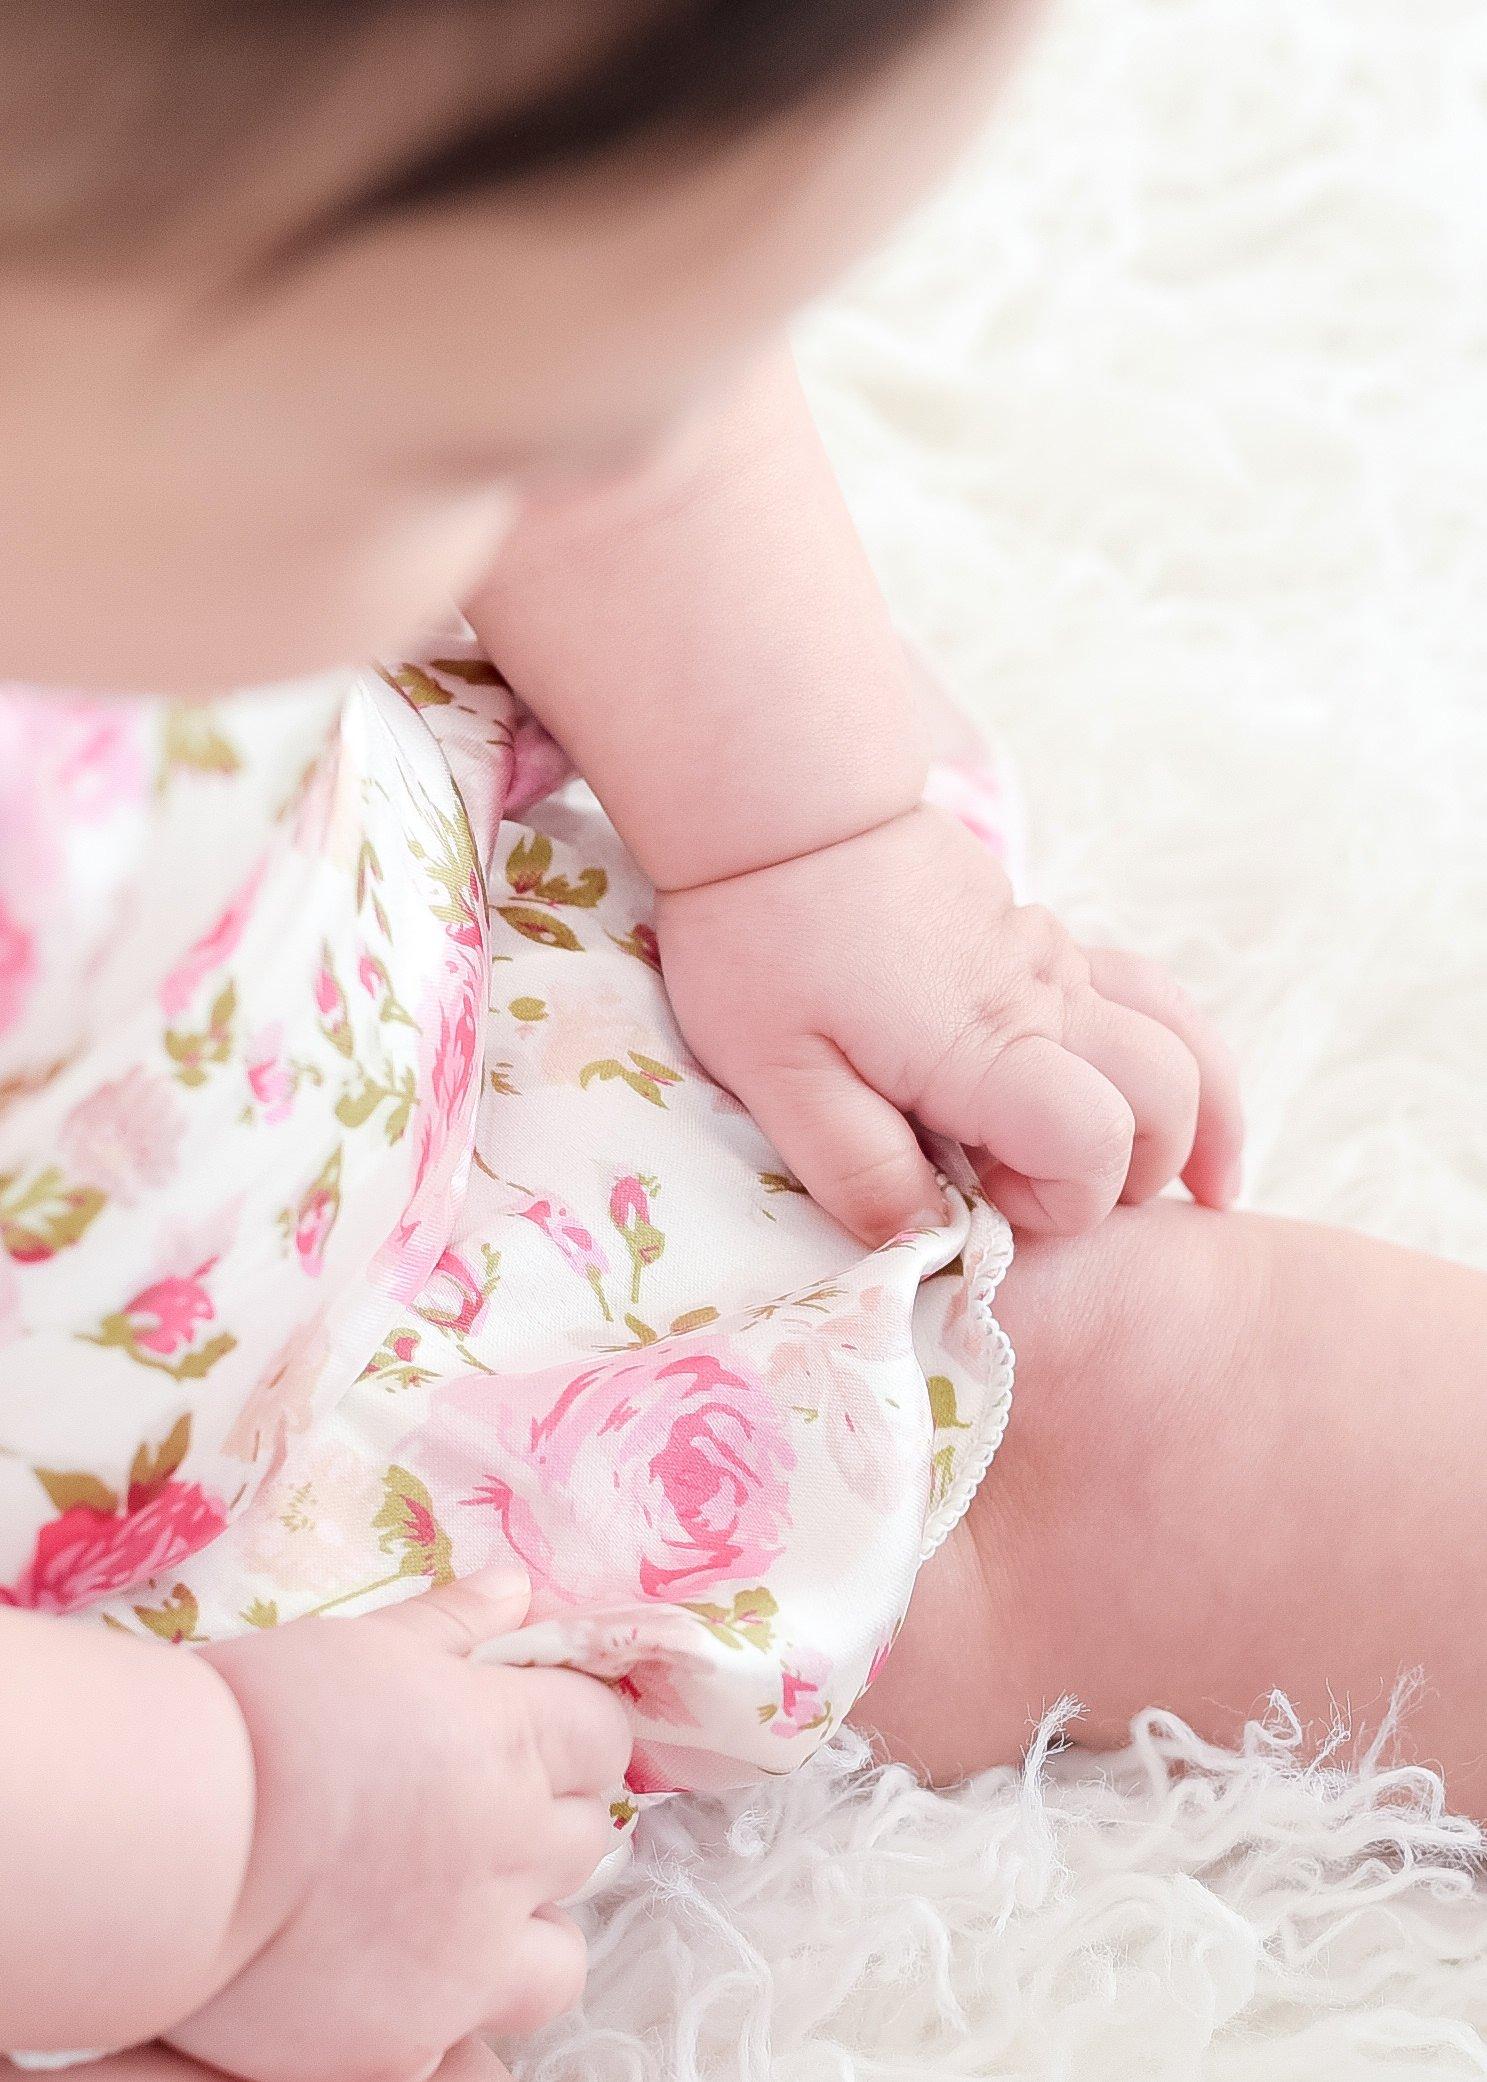 best baby photographer in Wilmington, MA, Q Hegarty Photography Weddings & Portraits